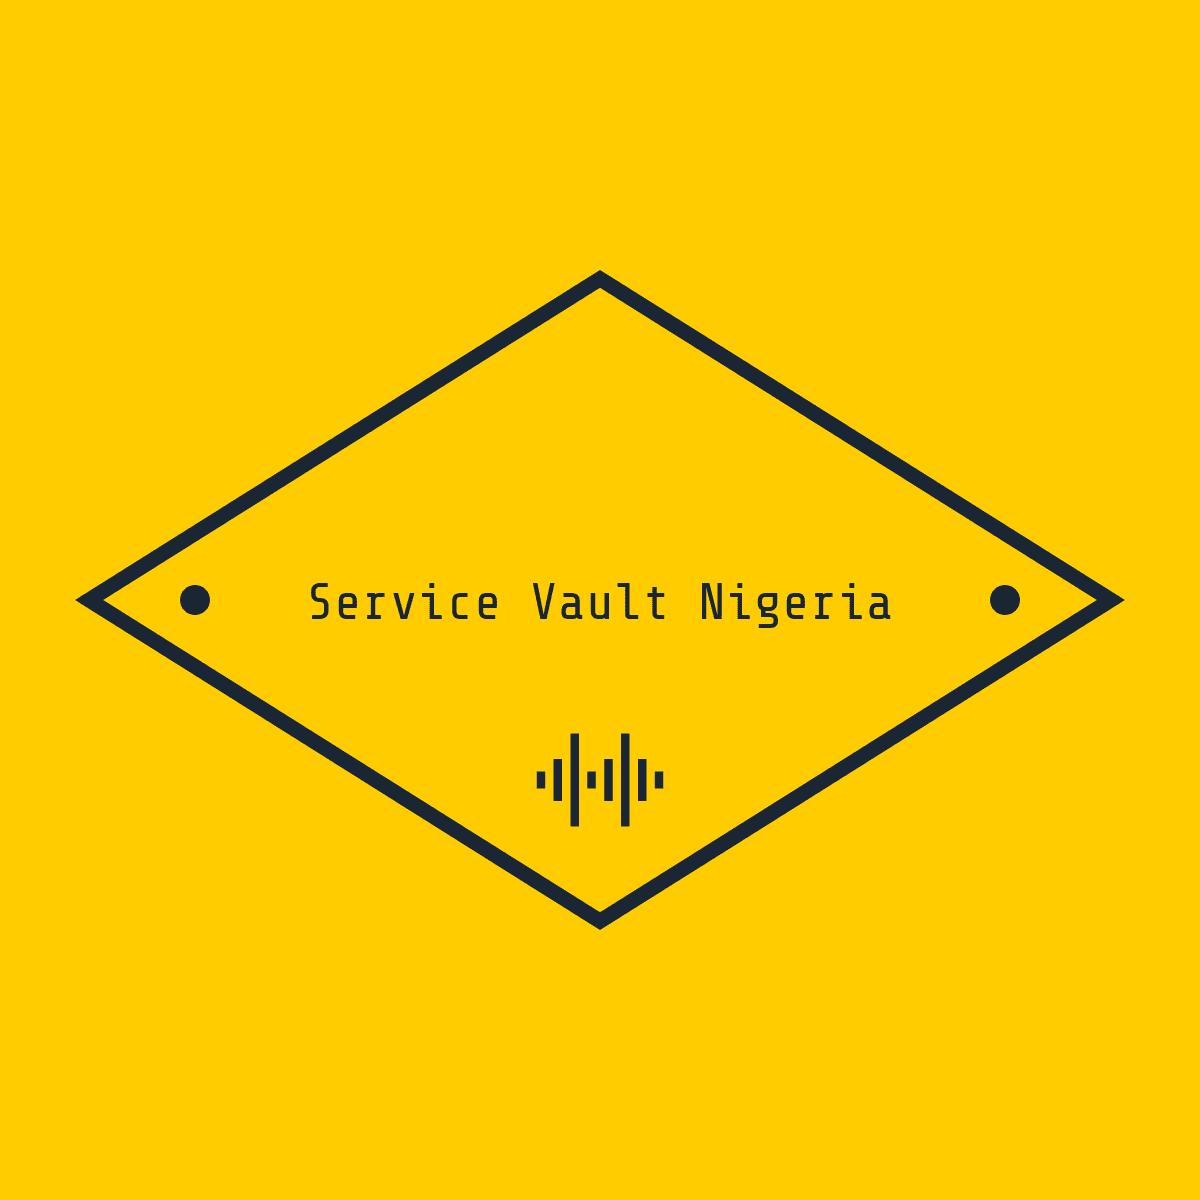 Service Vault Nigeria image